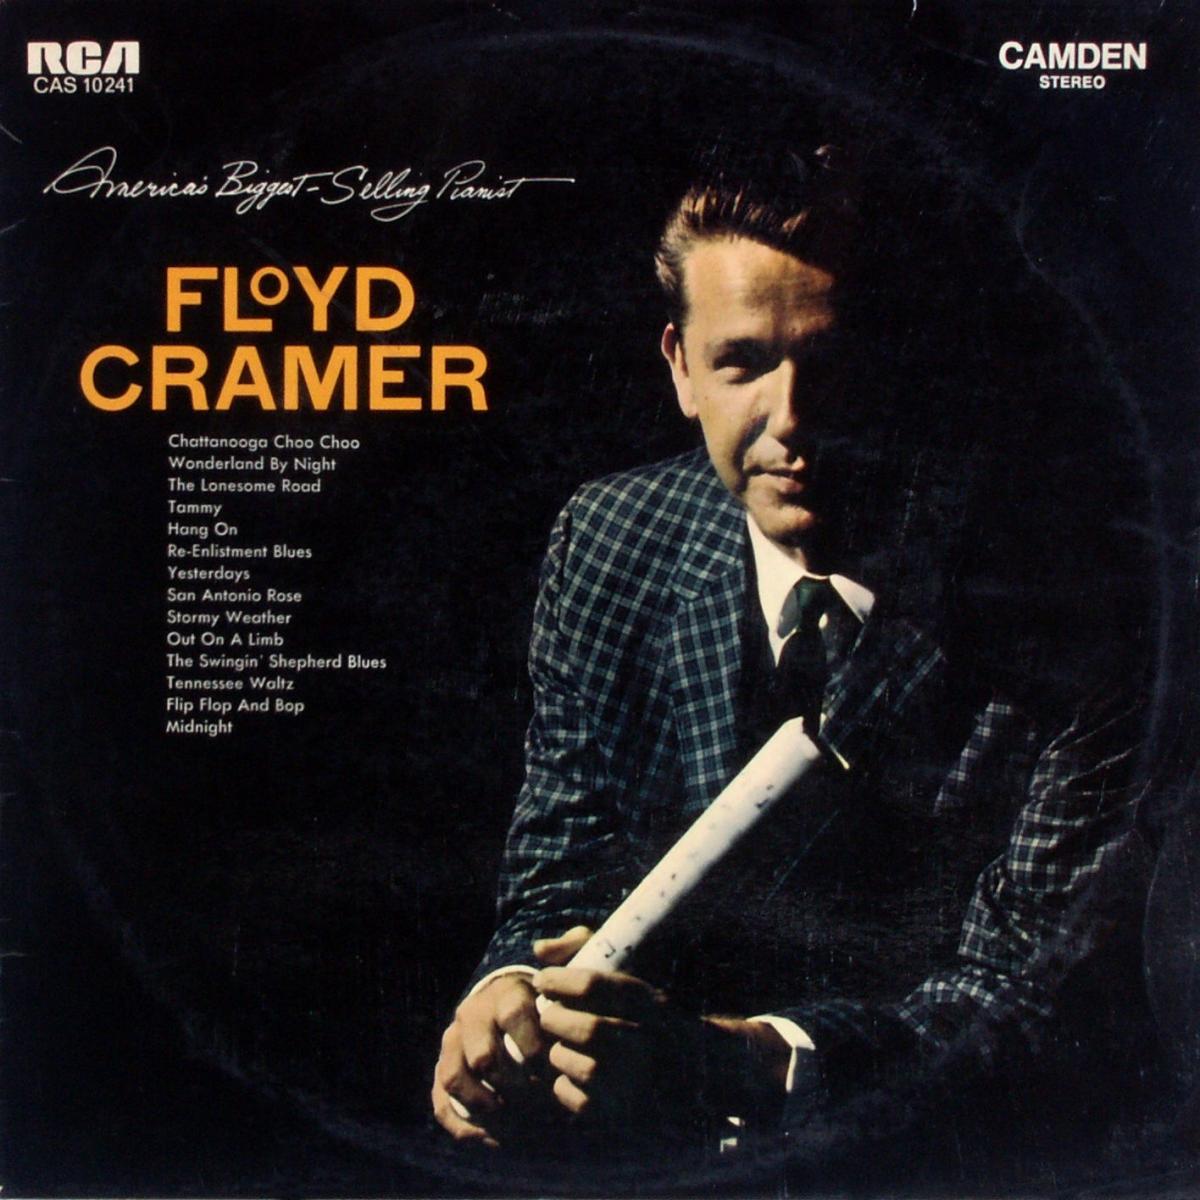 Cramer, Floyd - America's Biggest Selling Pianist [LP]